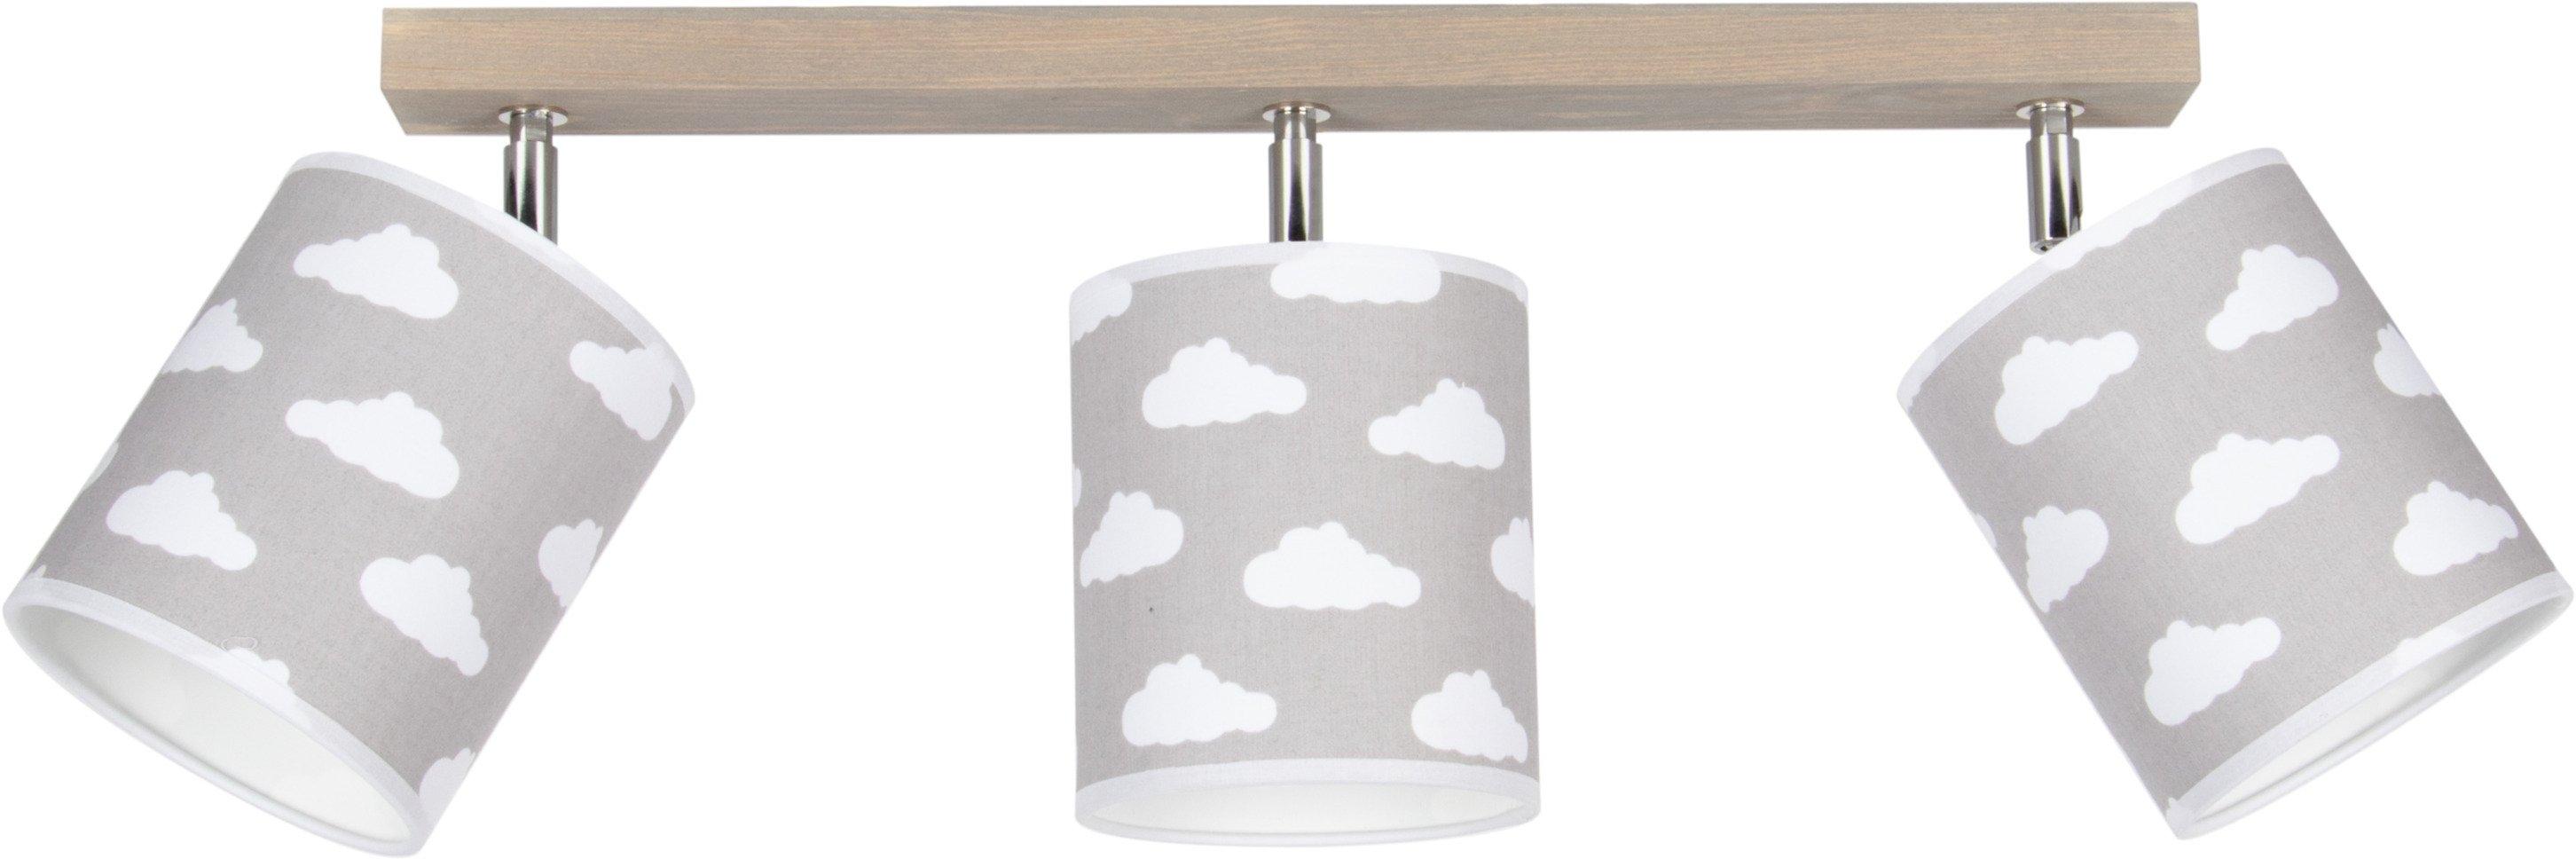 Lüttenhütt plafondlamp Fiete van massief hout, duurzaam met fsc®-certificaat, textielen kappen, bijpassende lm e27/exclusief, made in europe (1 stuk) - verschillende betaalmethodes